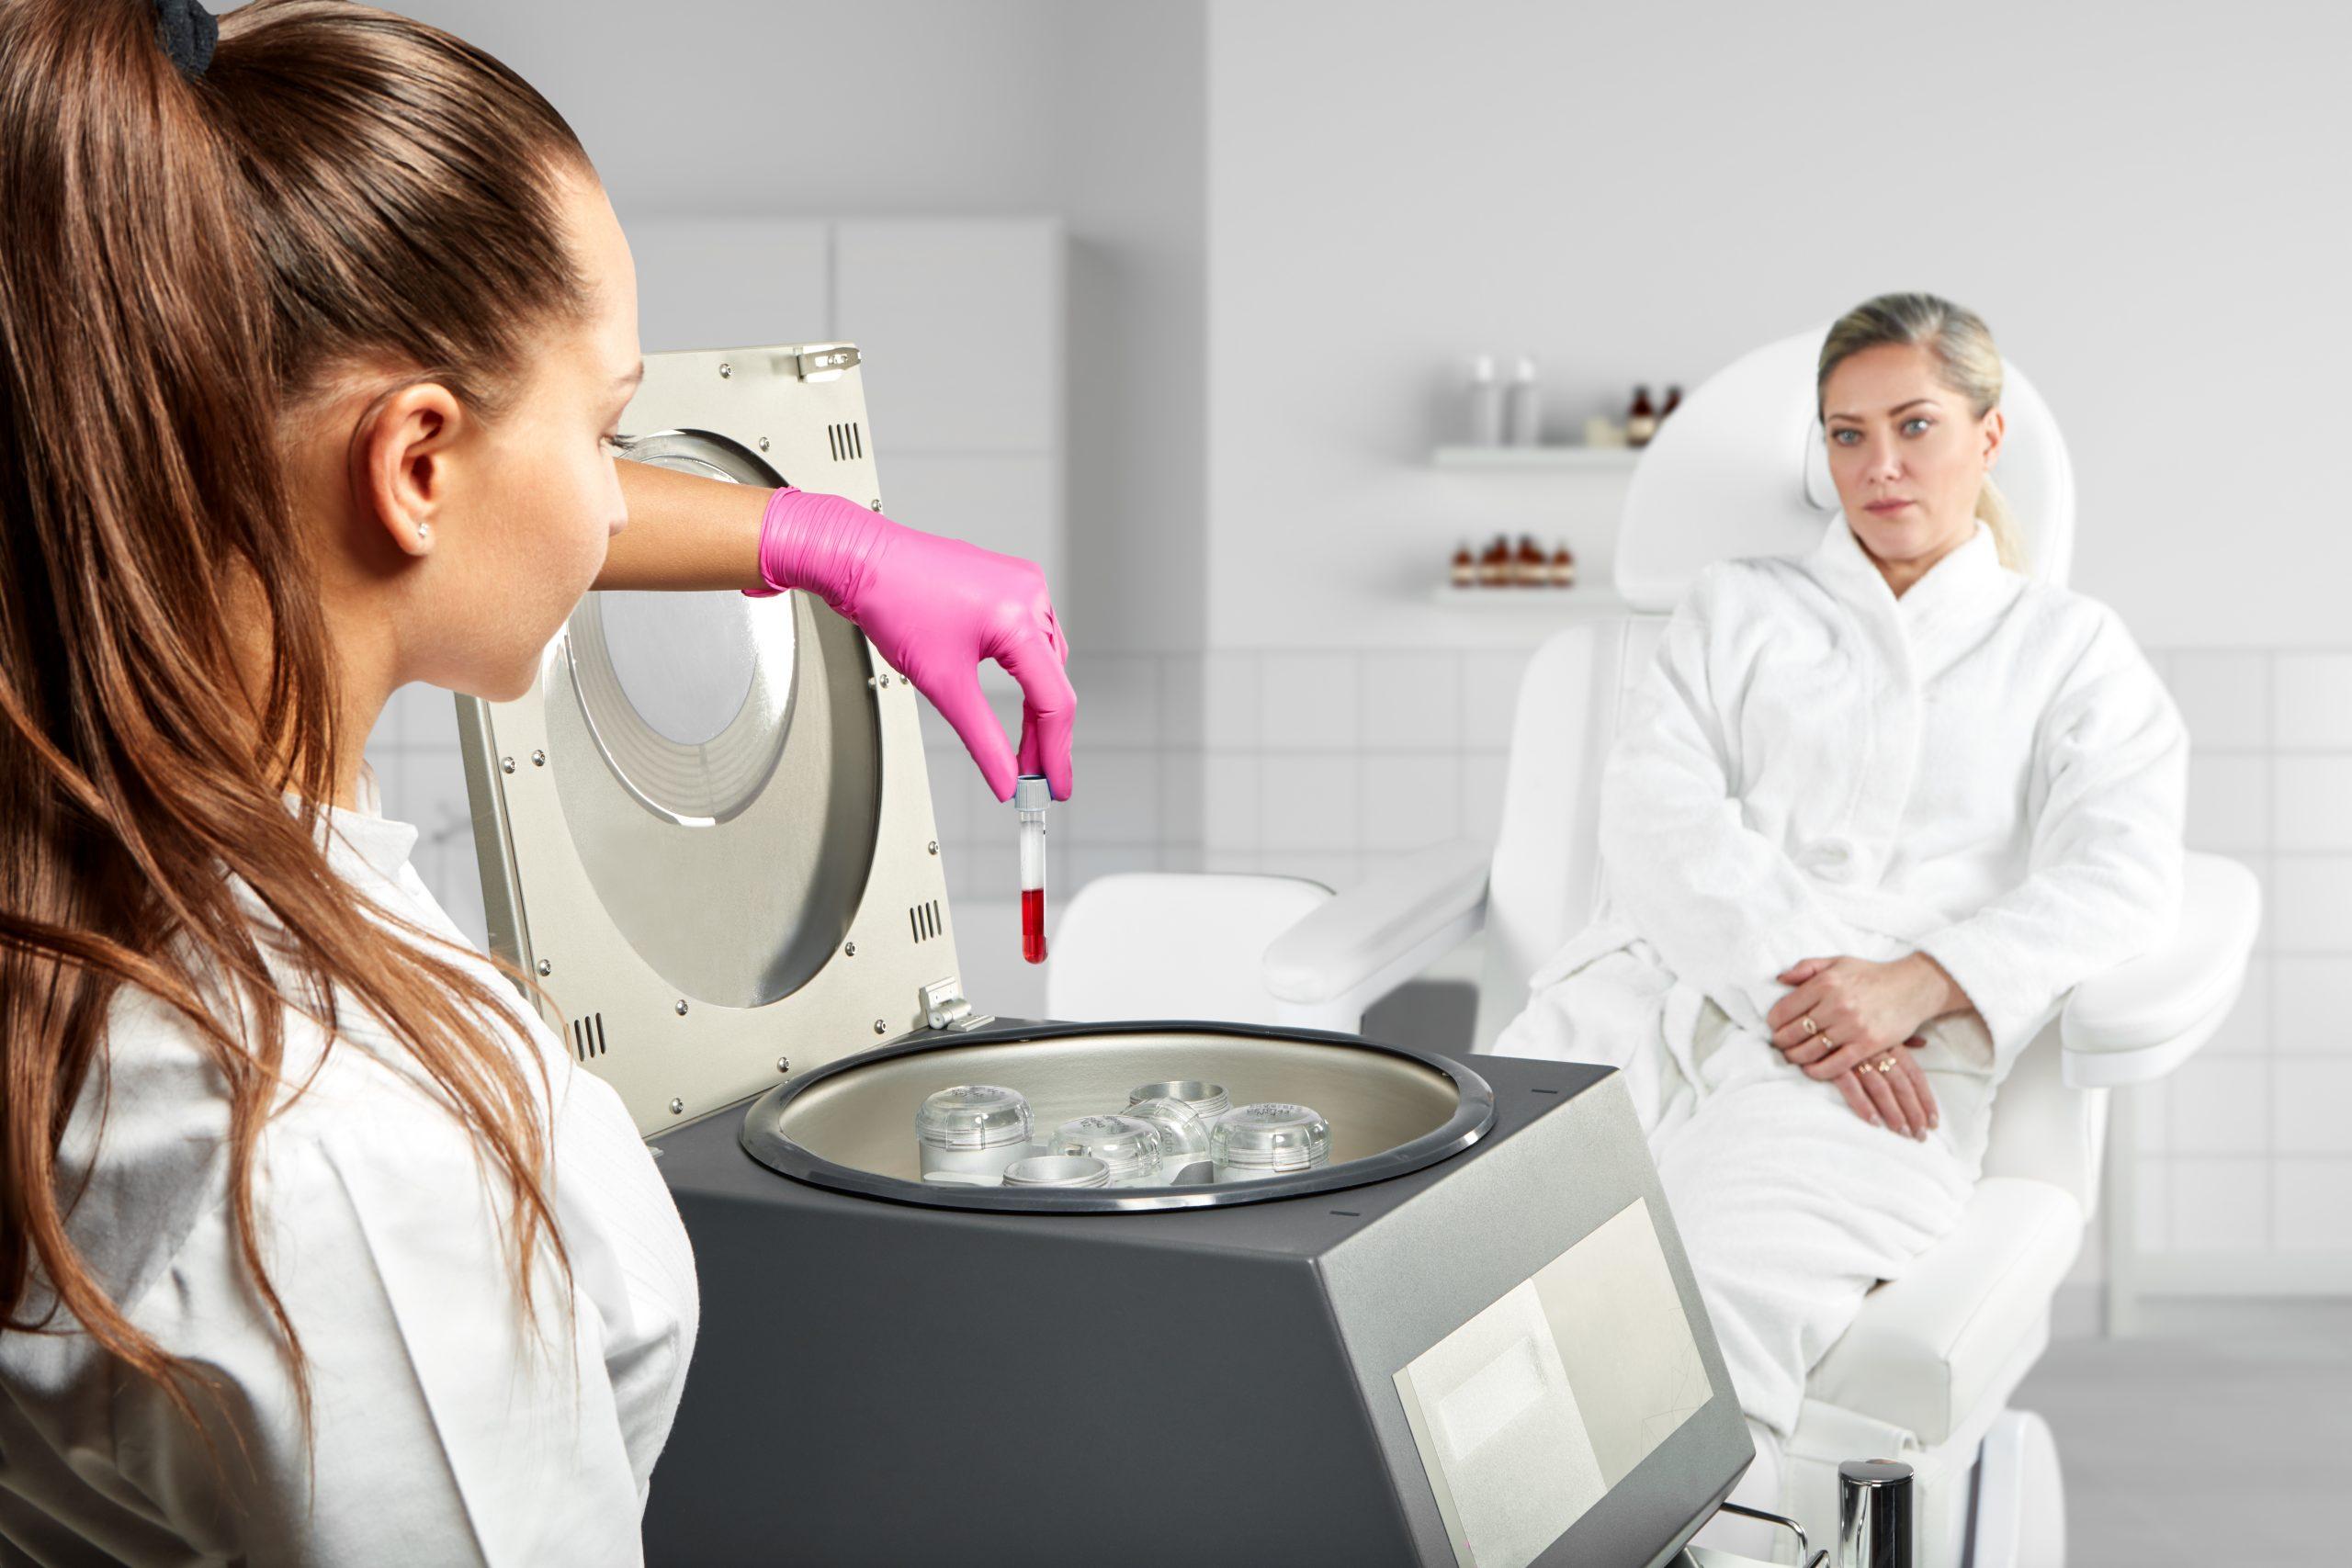 platelet-rich plasma prp skin cosmetics london